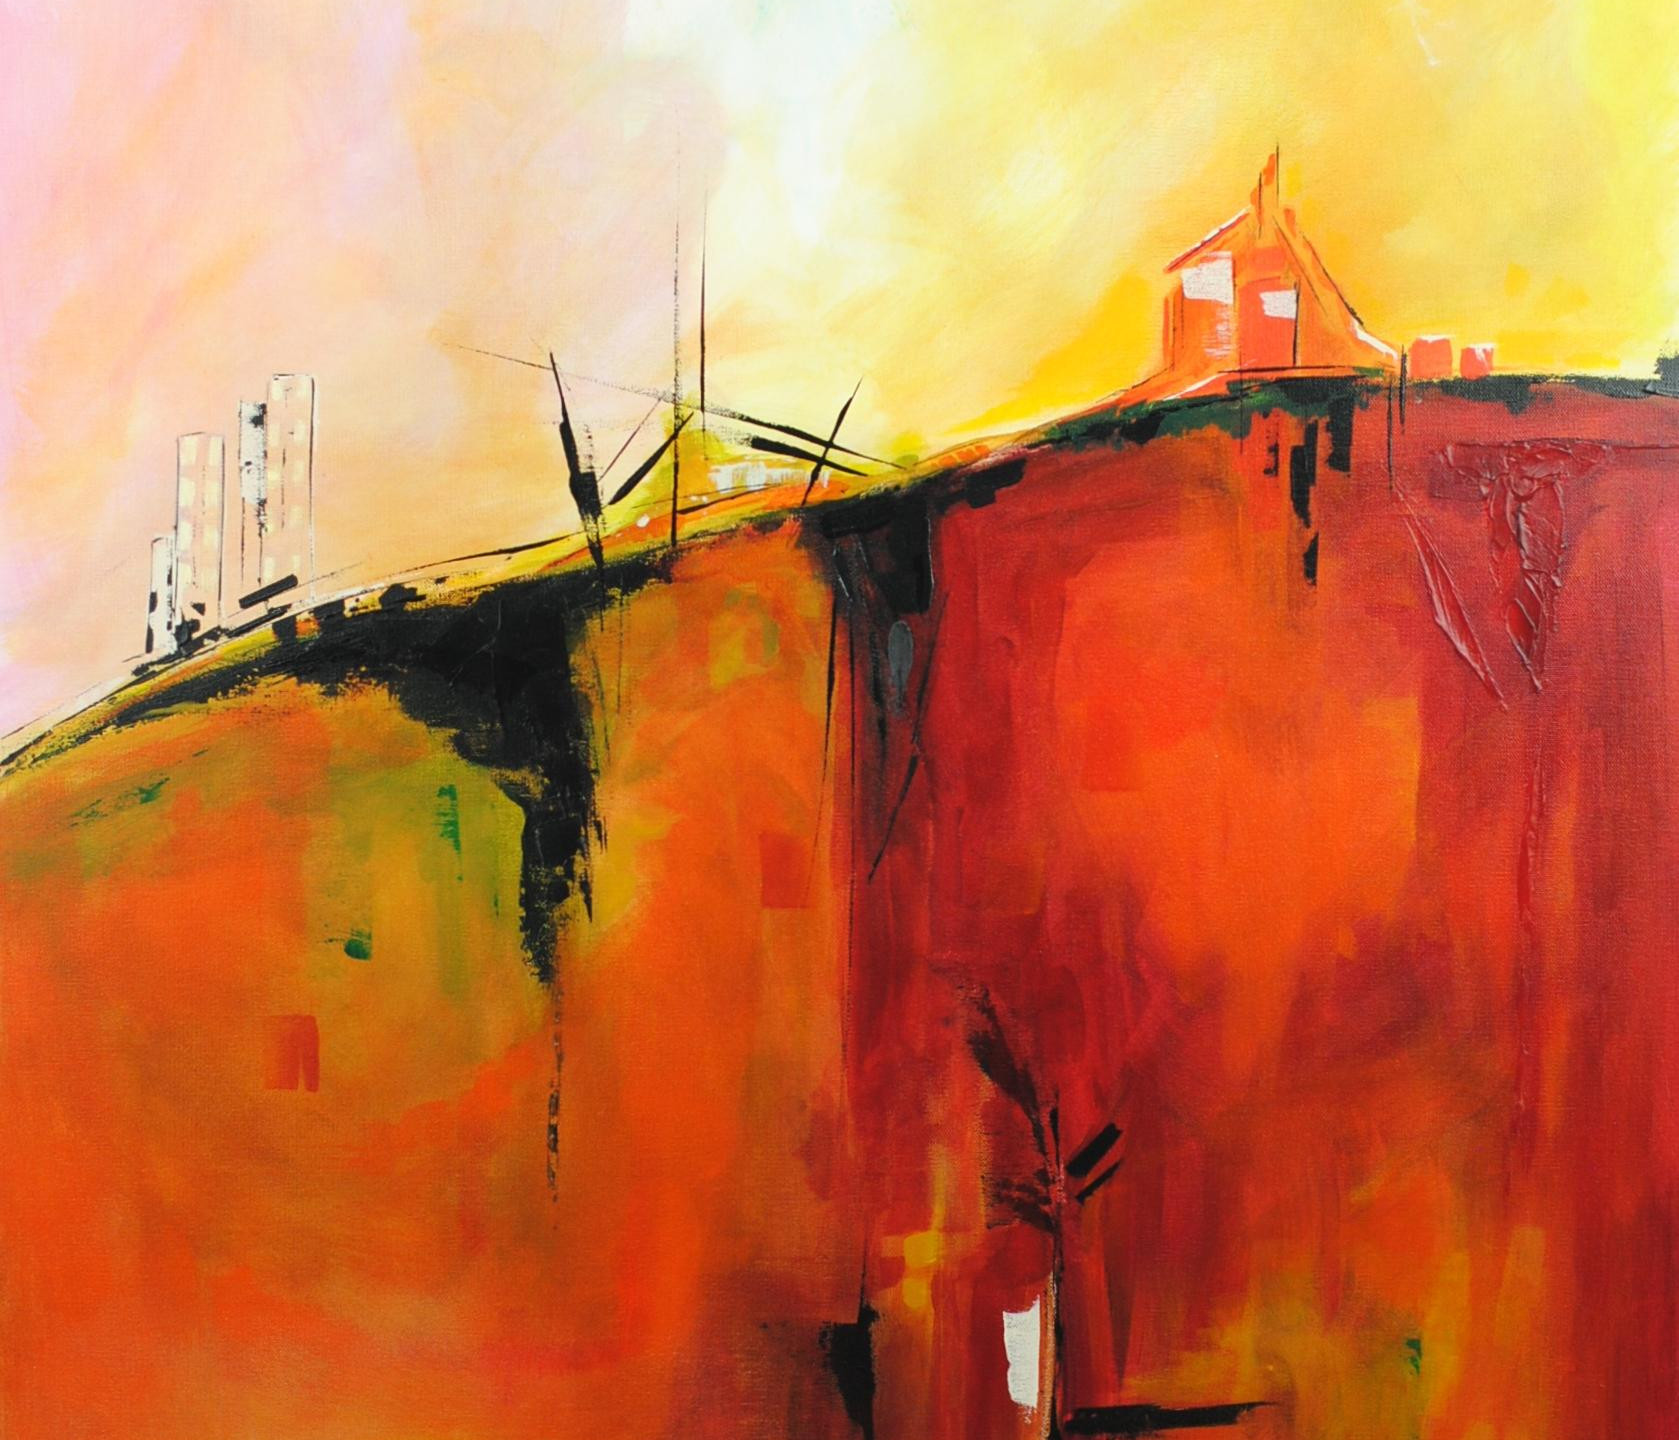 Duffhues, Jose - Industrial Solitude 5